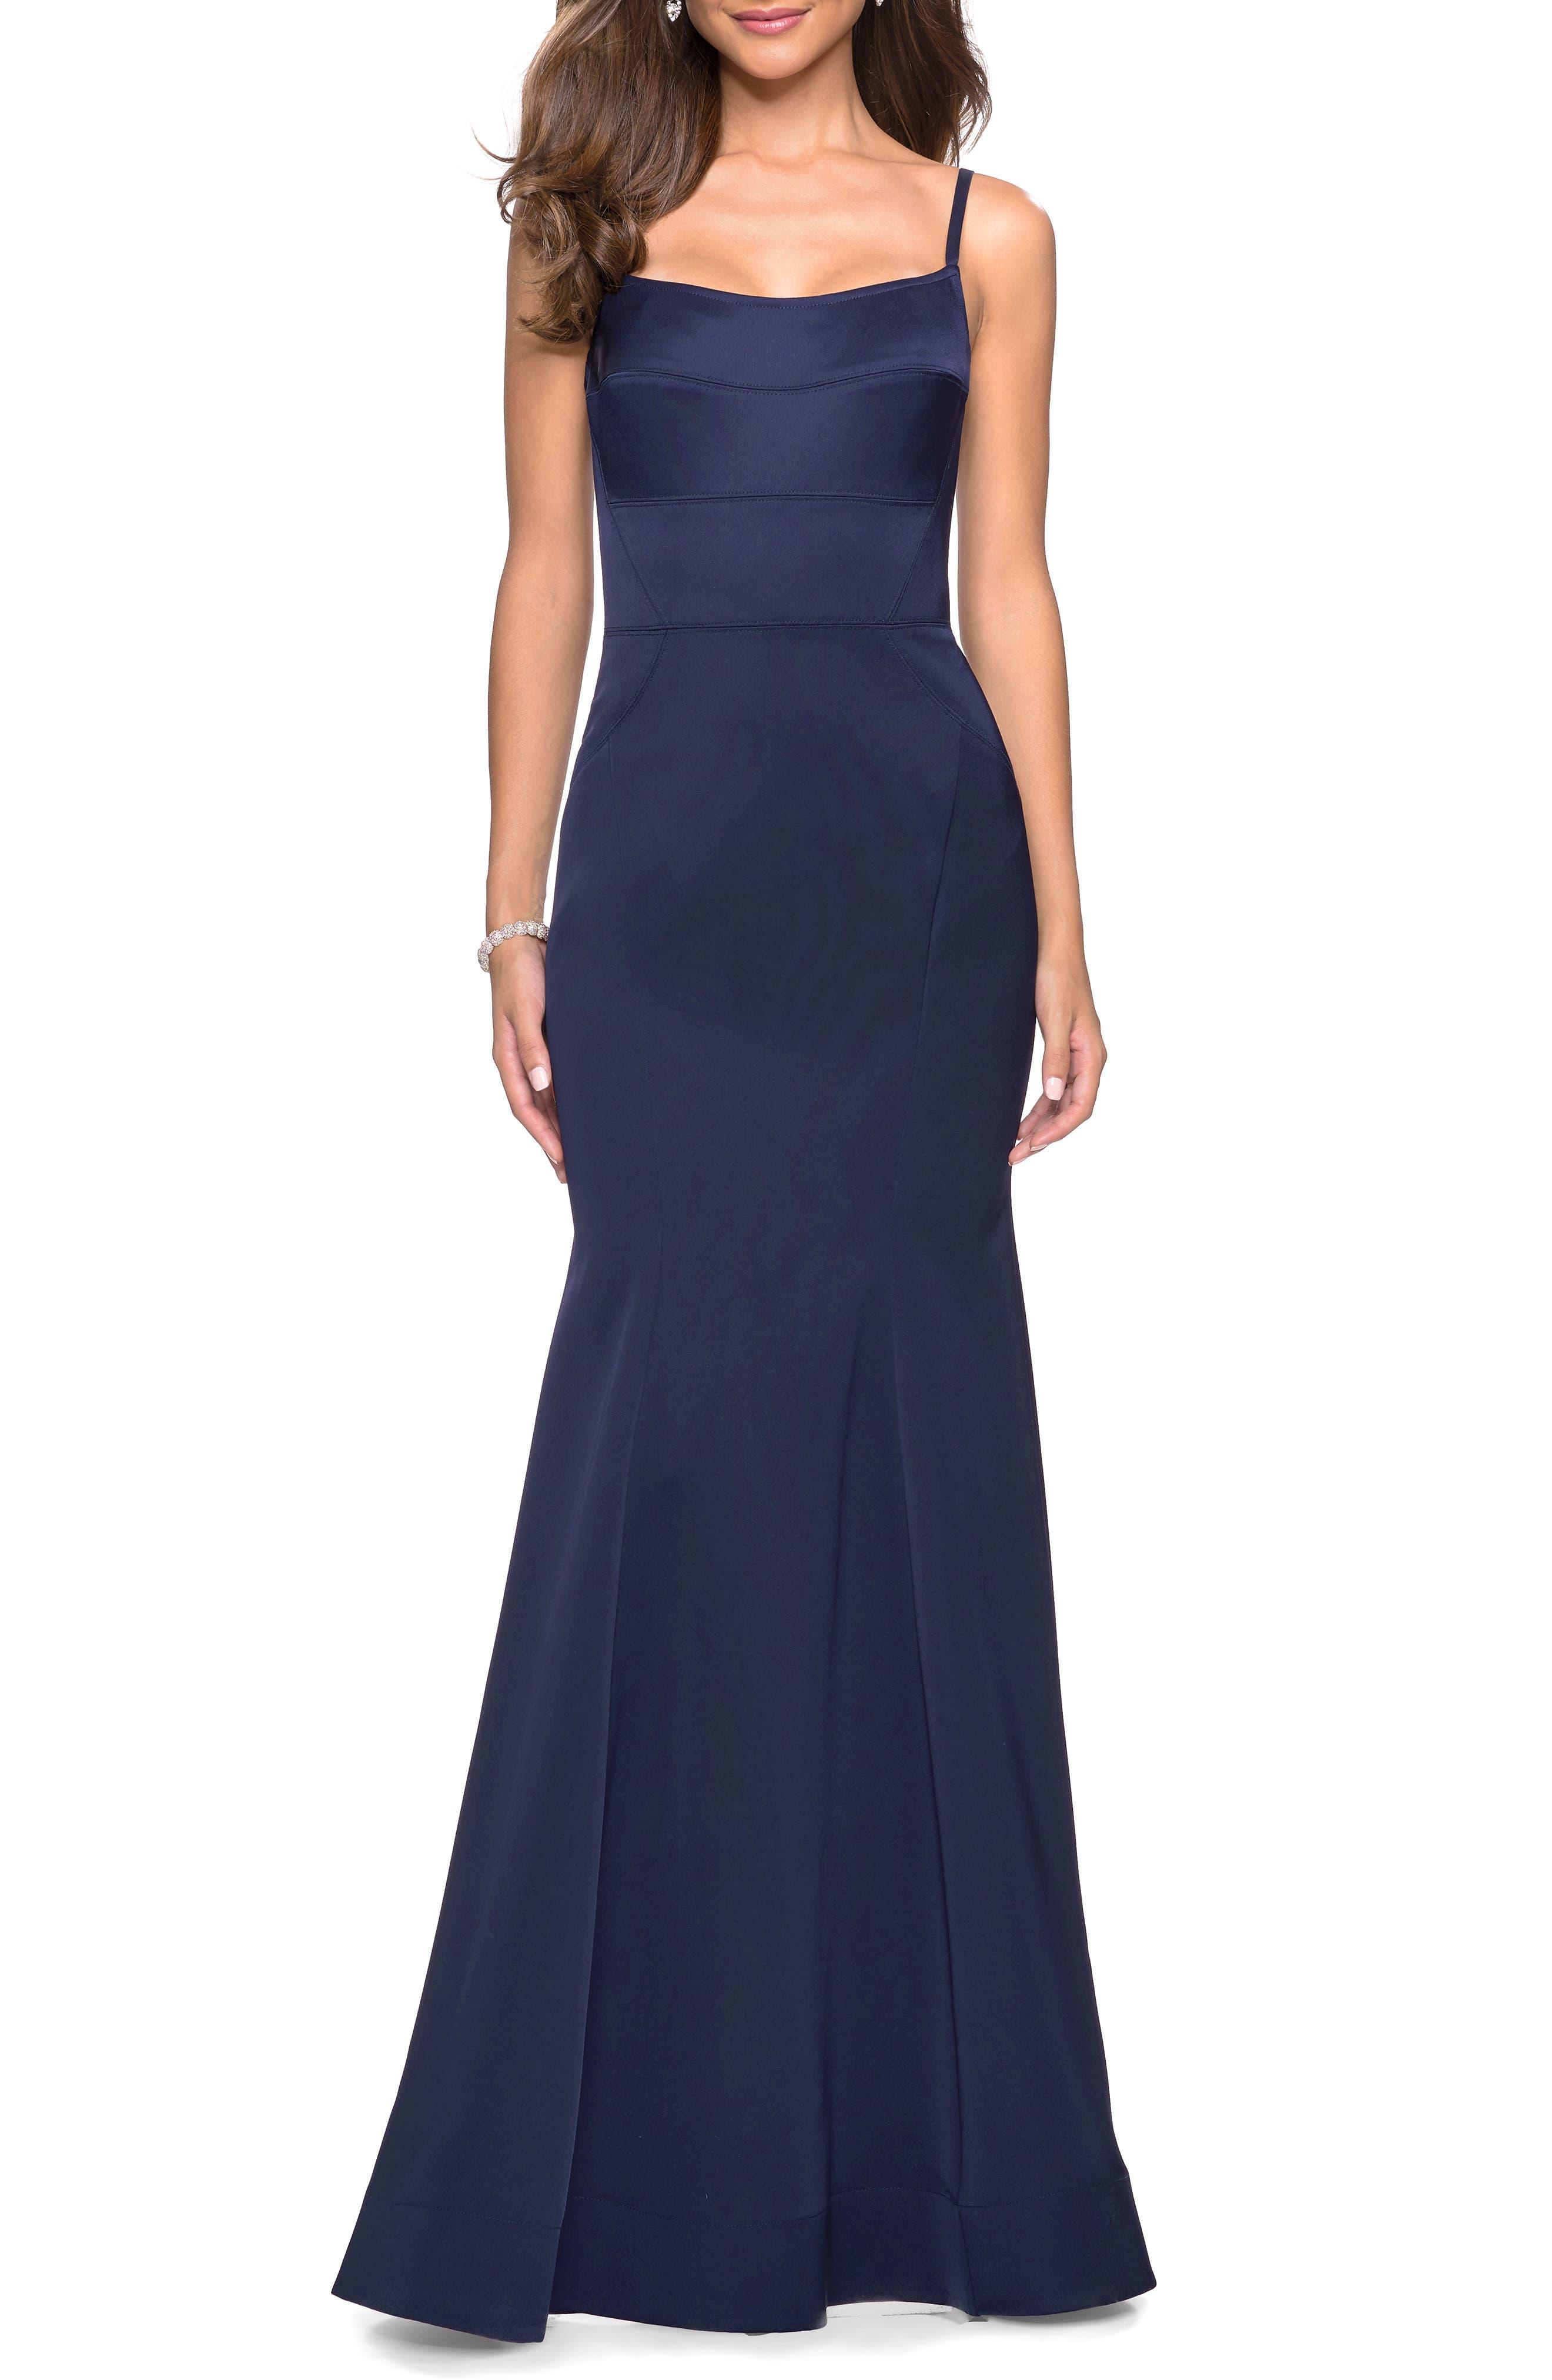 La Femme Structured Thick Jersey Trumpet Evening Dress, Blue